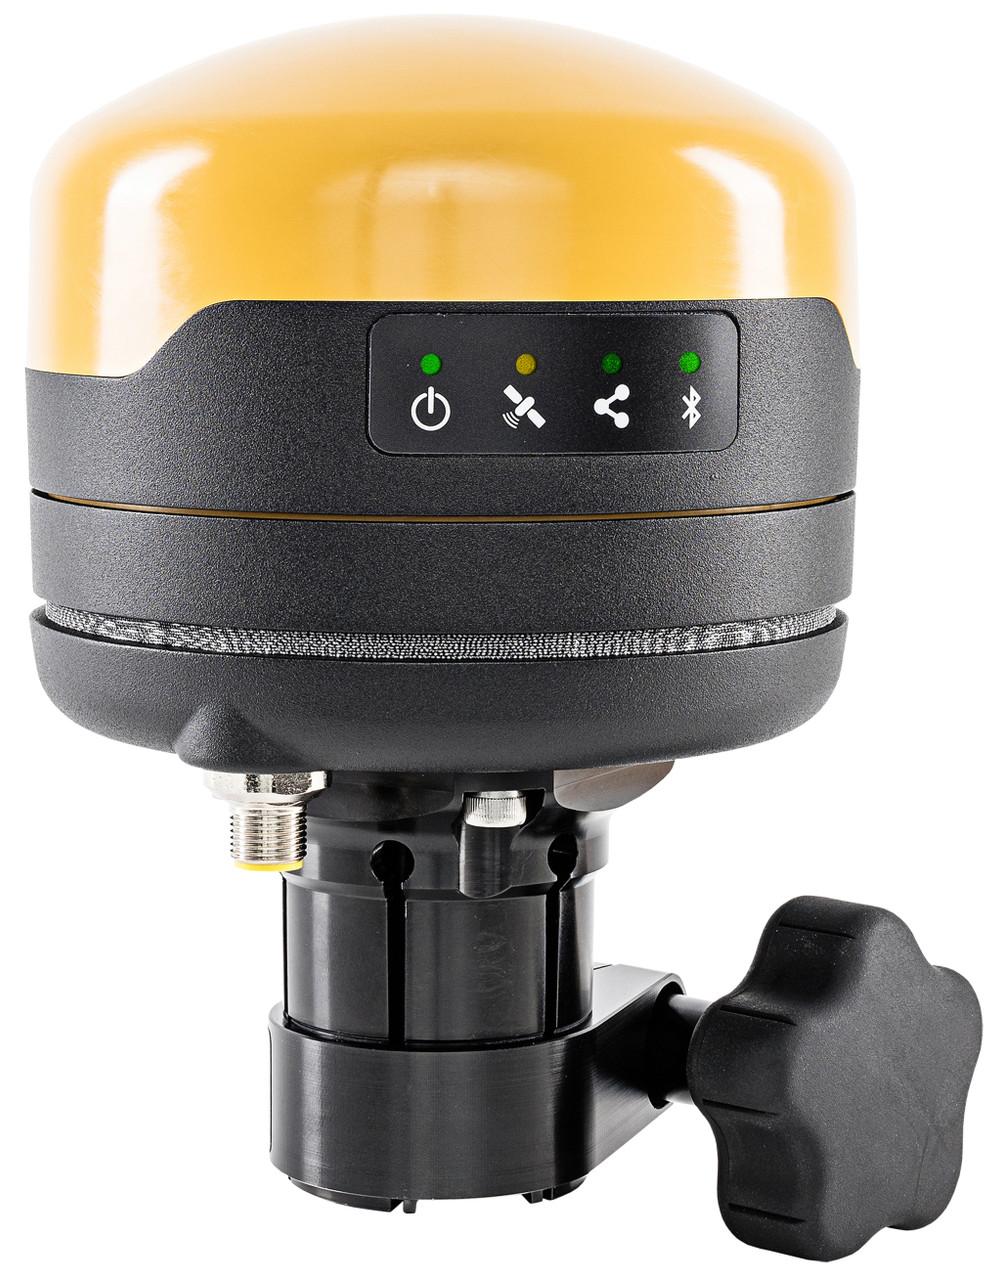 Topcon X-53x Excavator GPS Indicate System